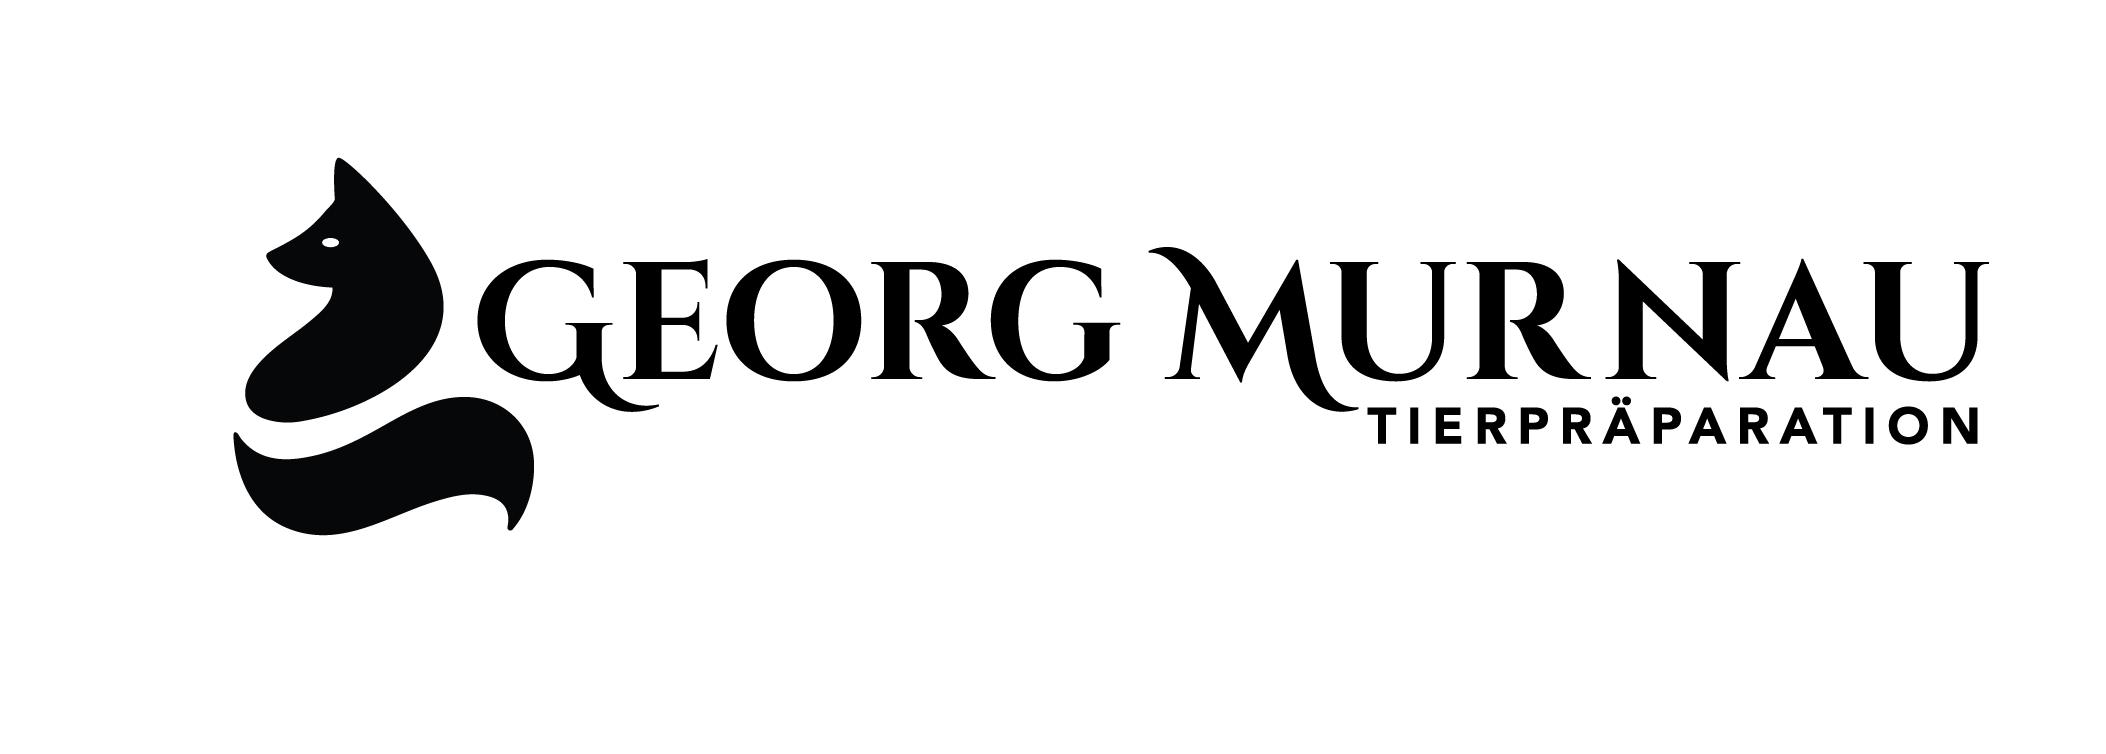 GeorgMurnau_Final_mitauge_Final.png